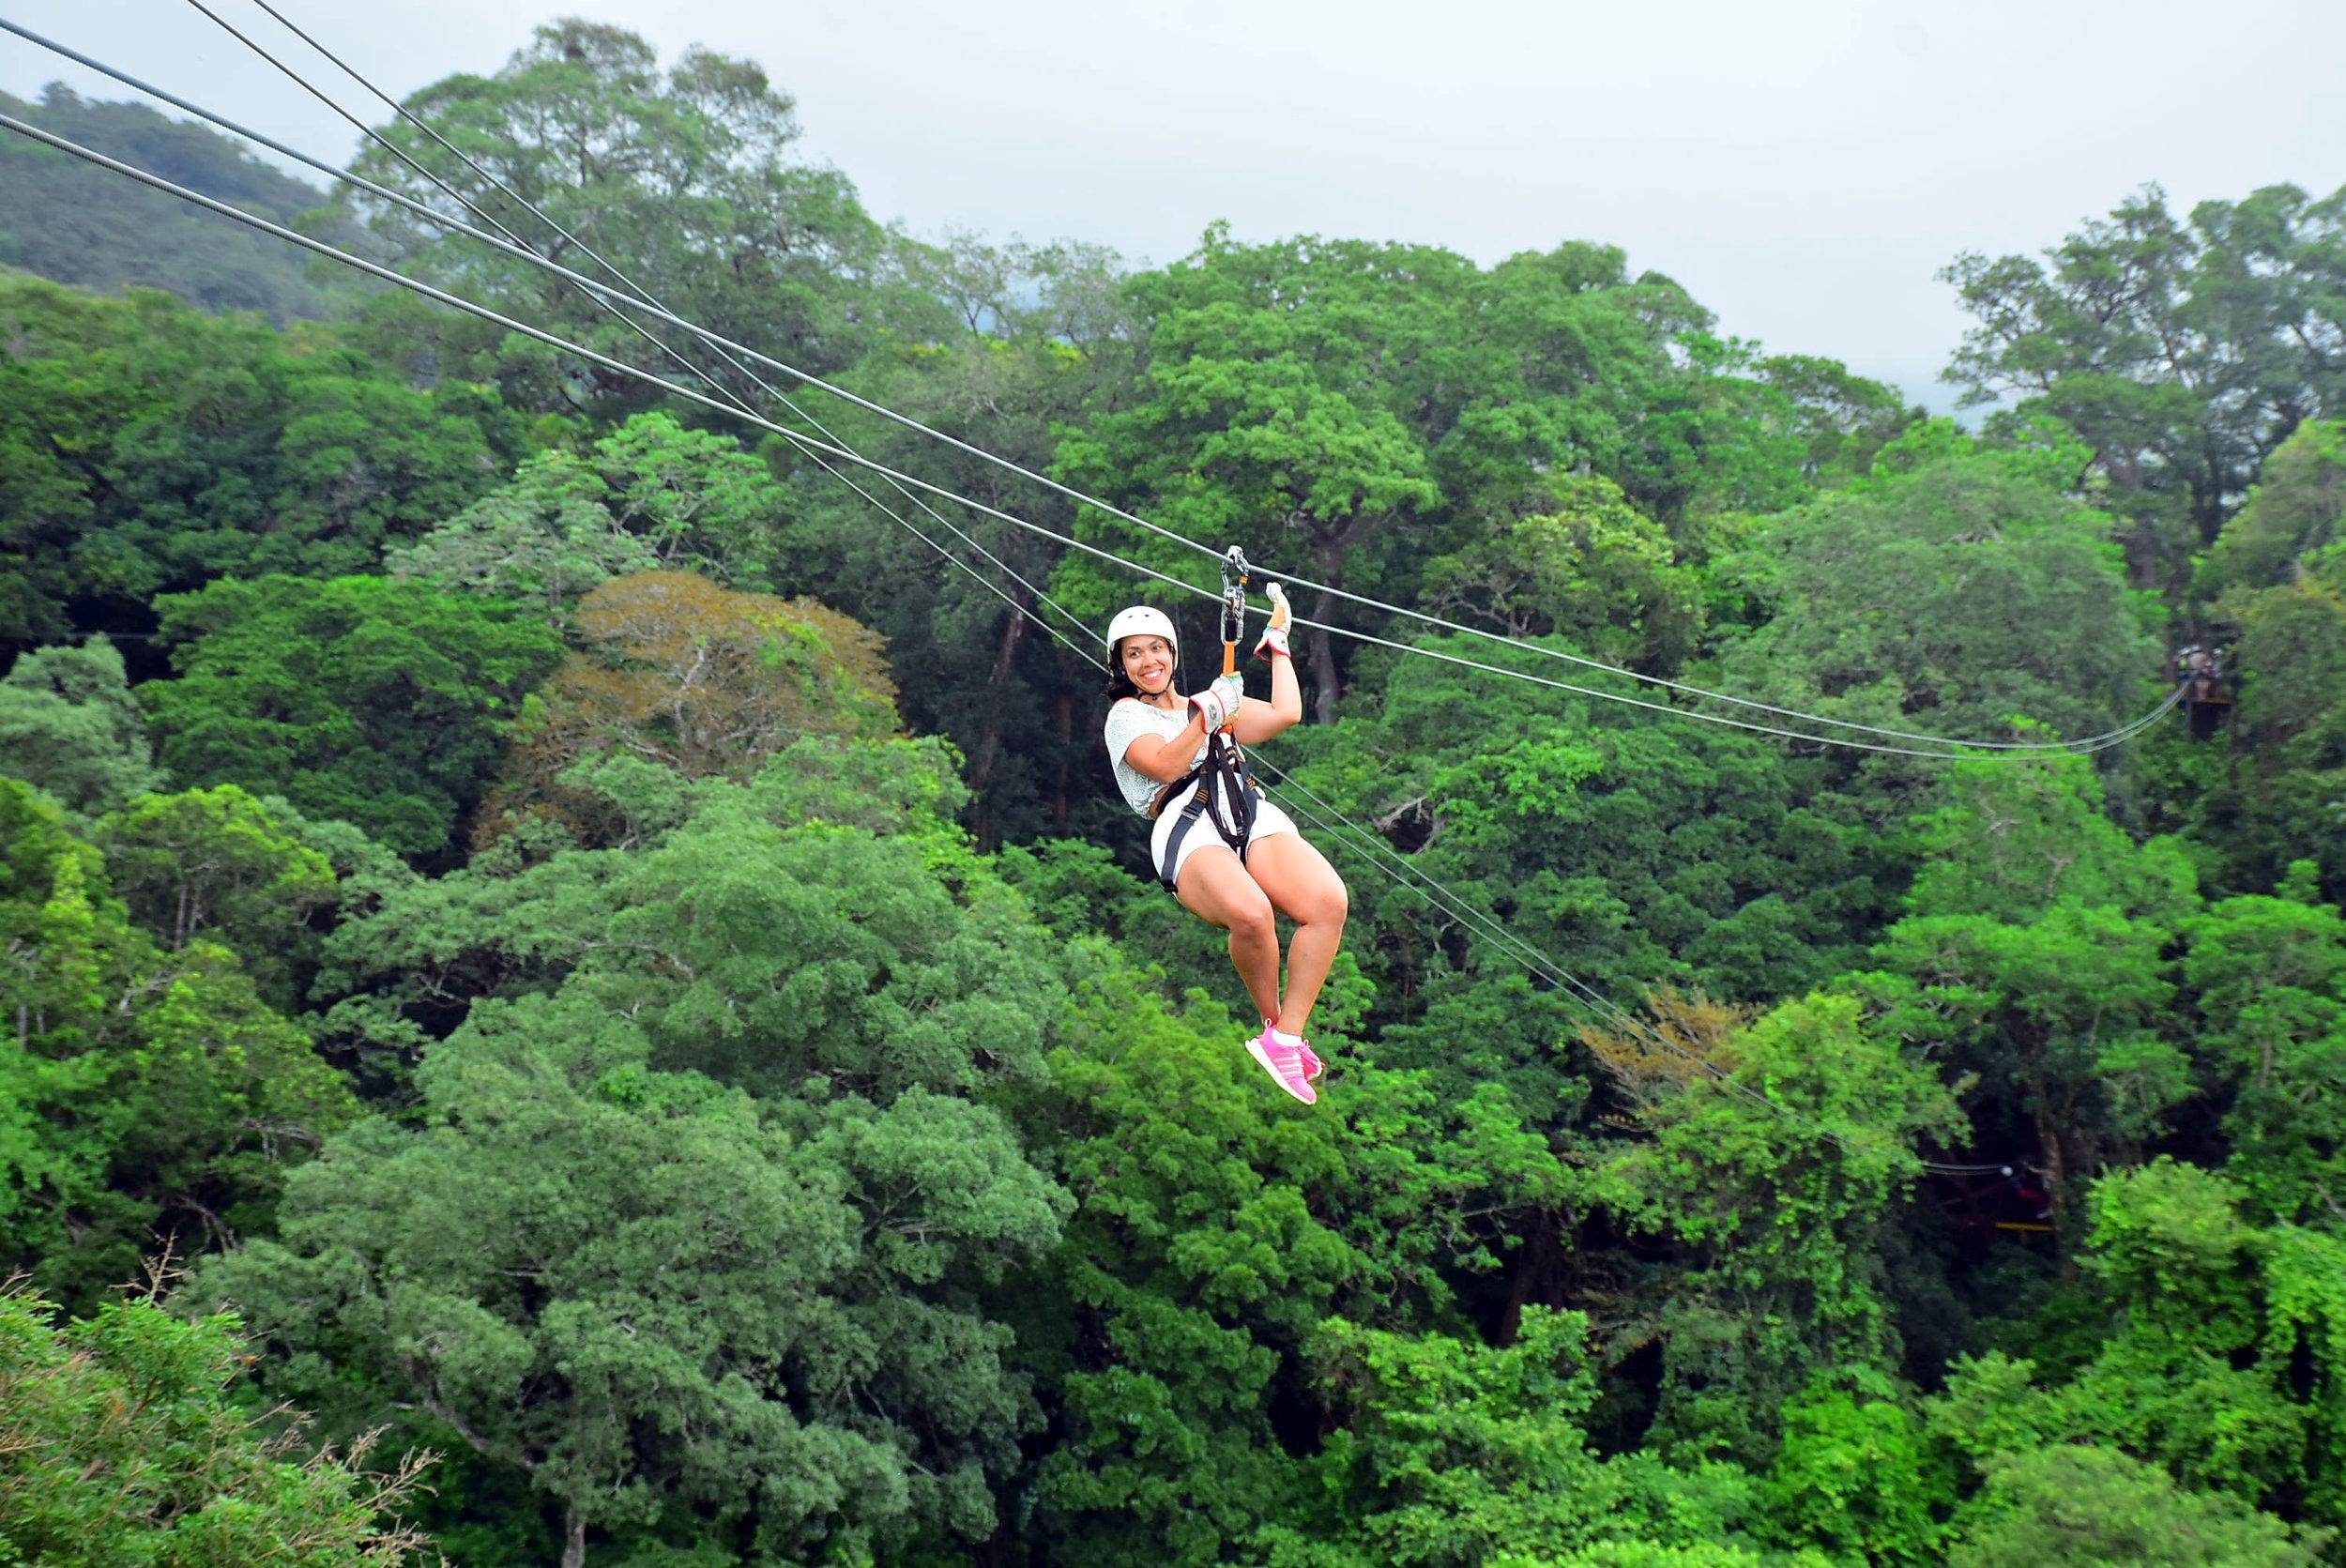 zip lining Costa Rica.jpg